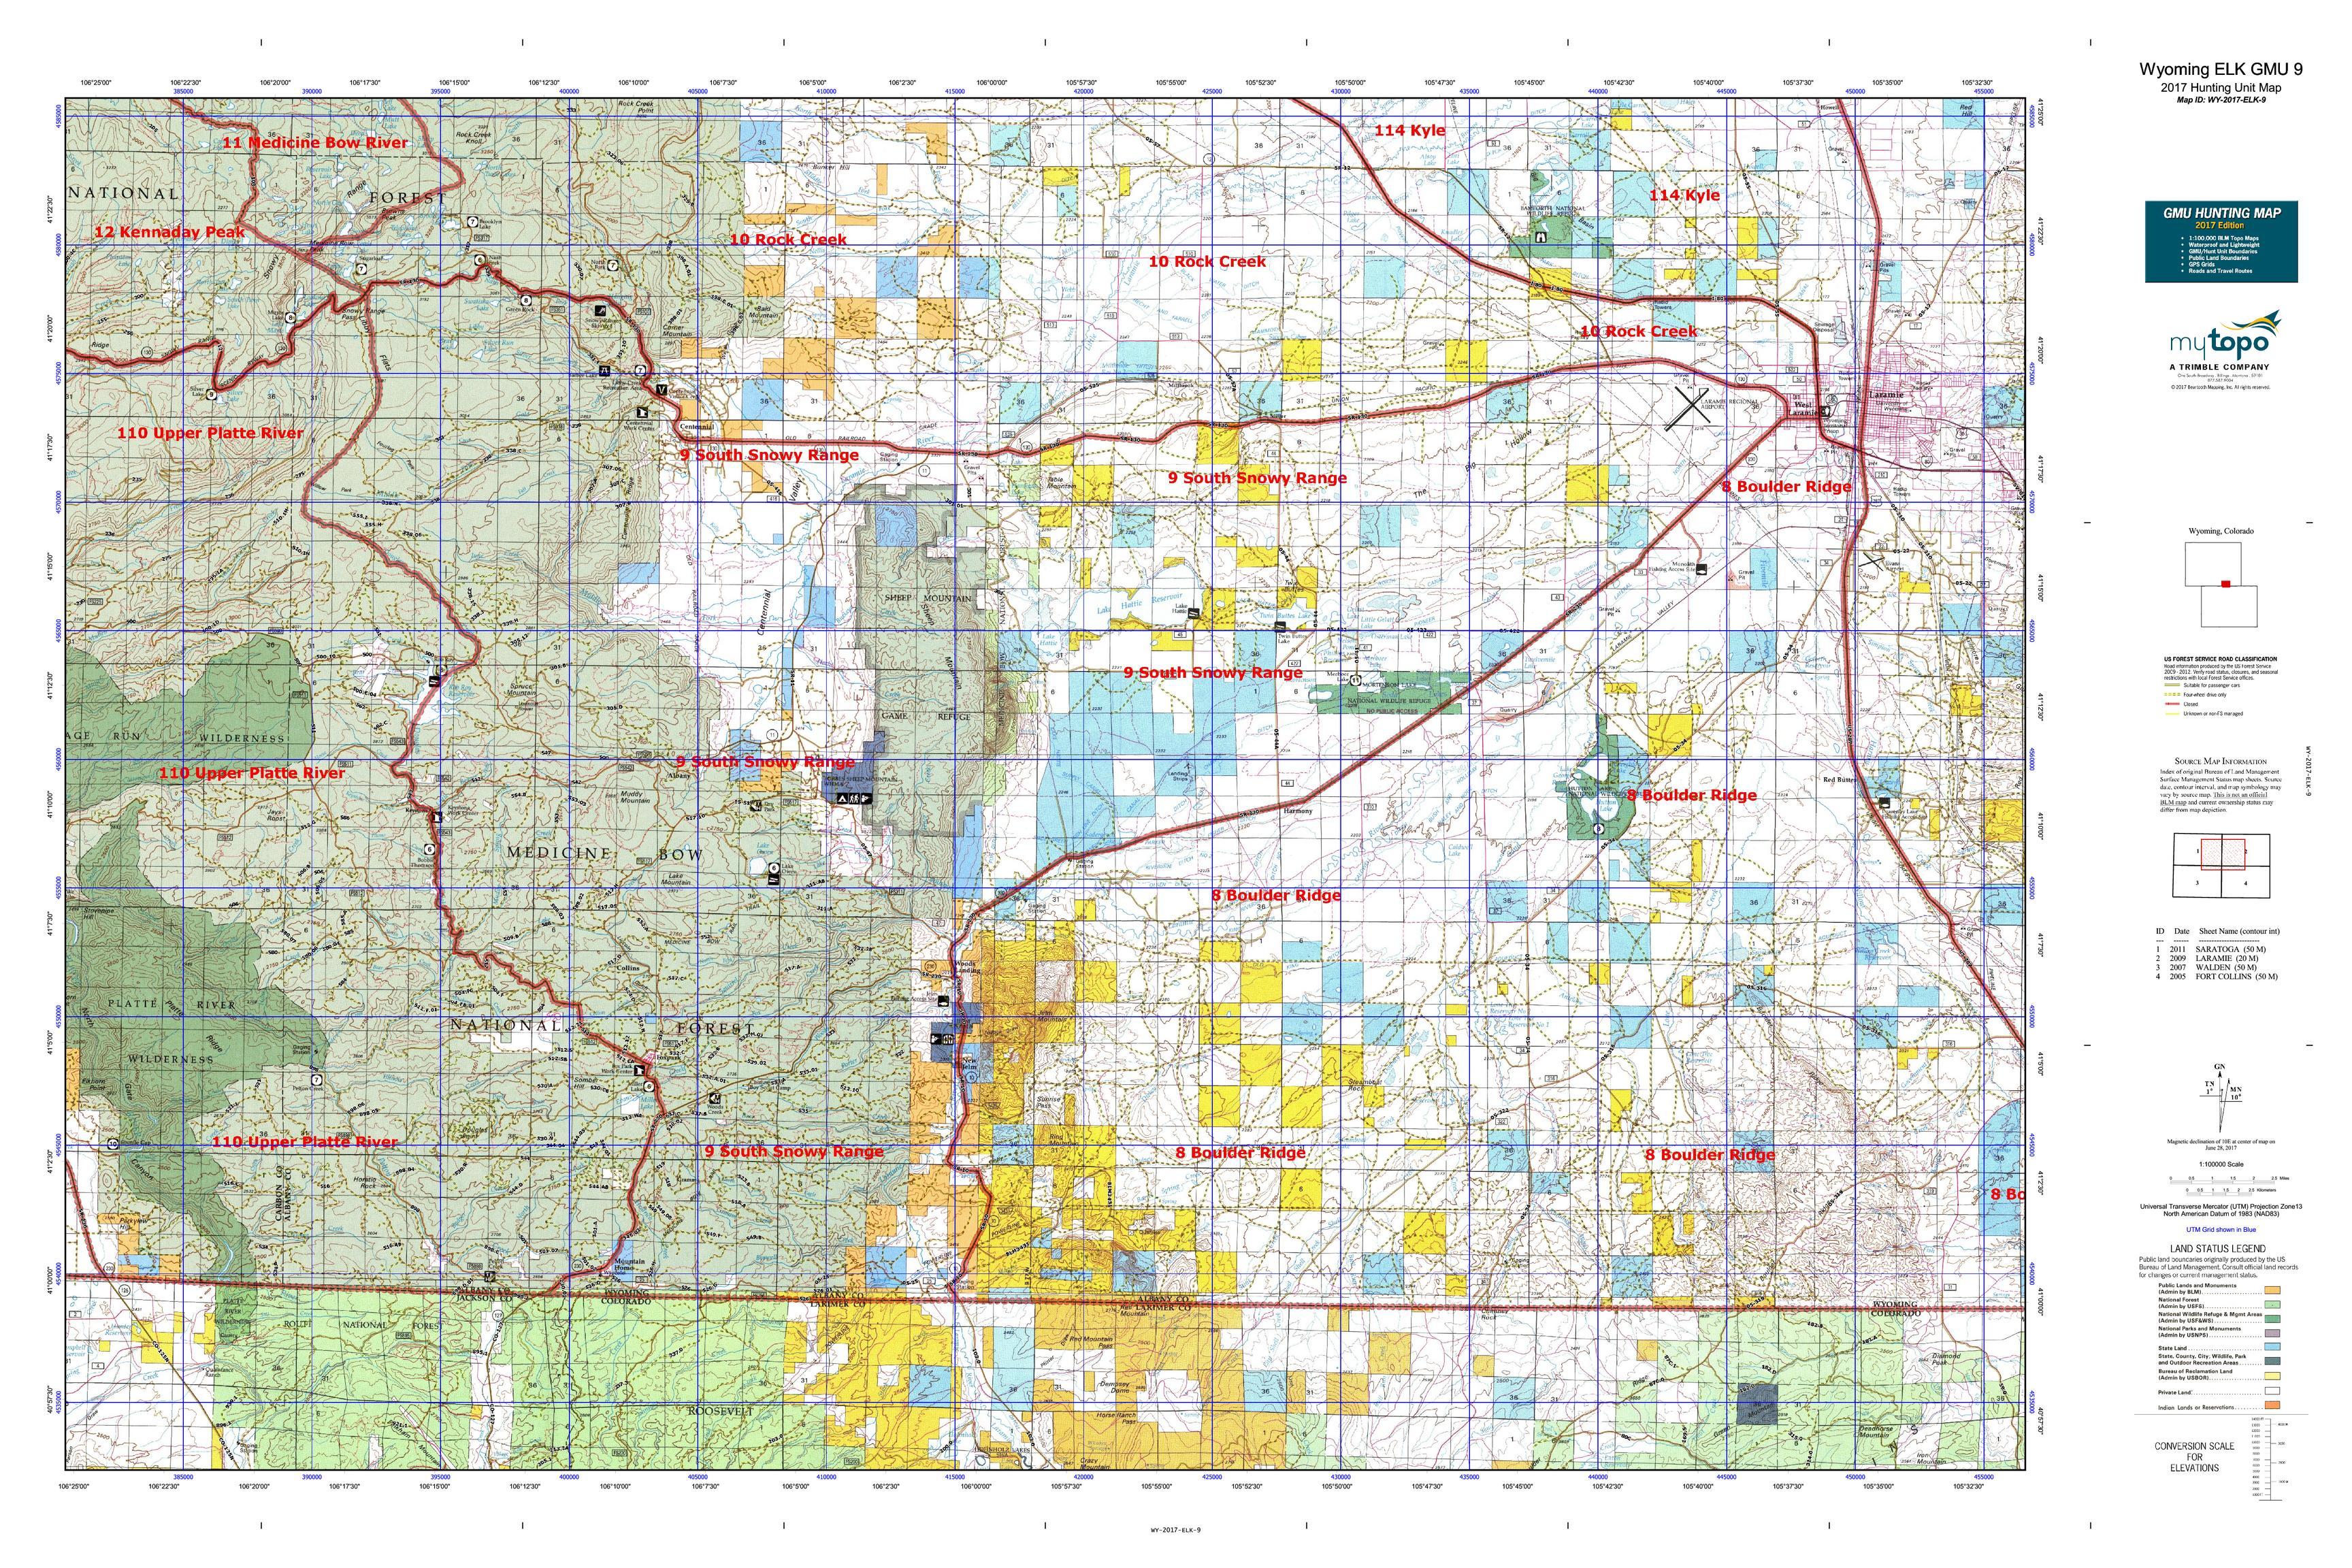 Wyoming ELK GMU Map MyTopo - Detailed map of wyoming